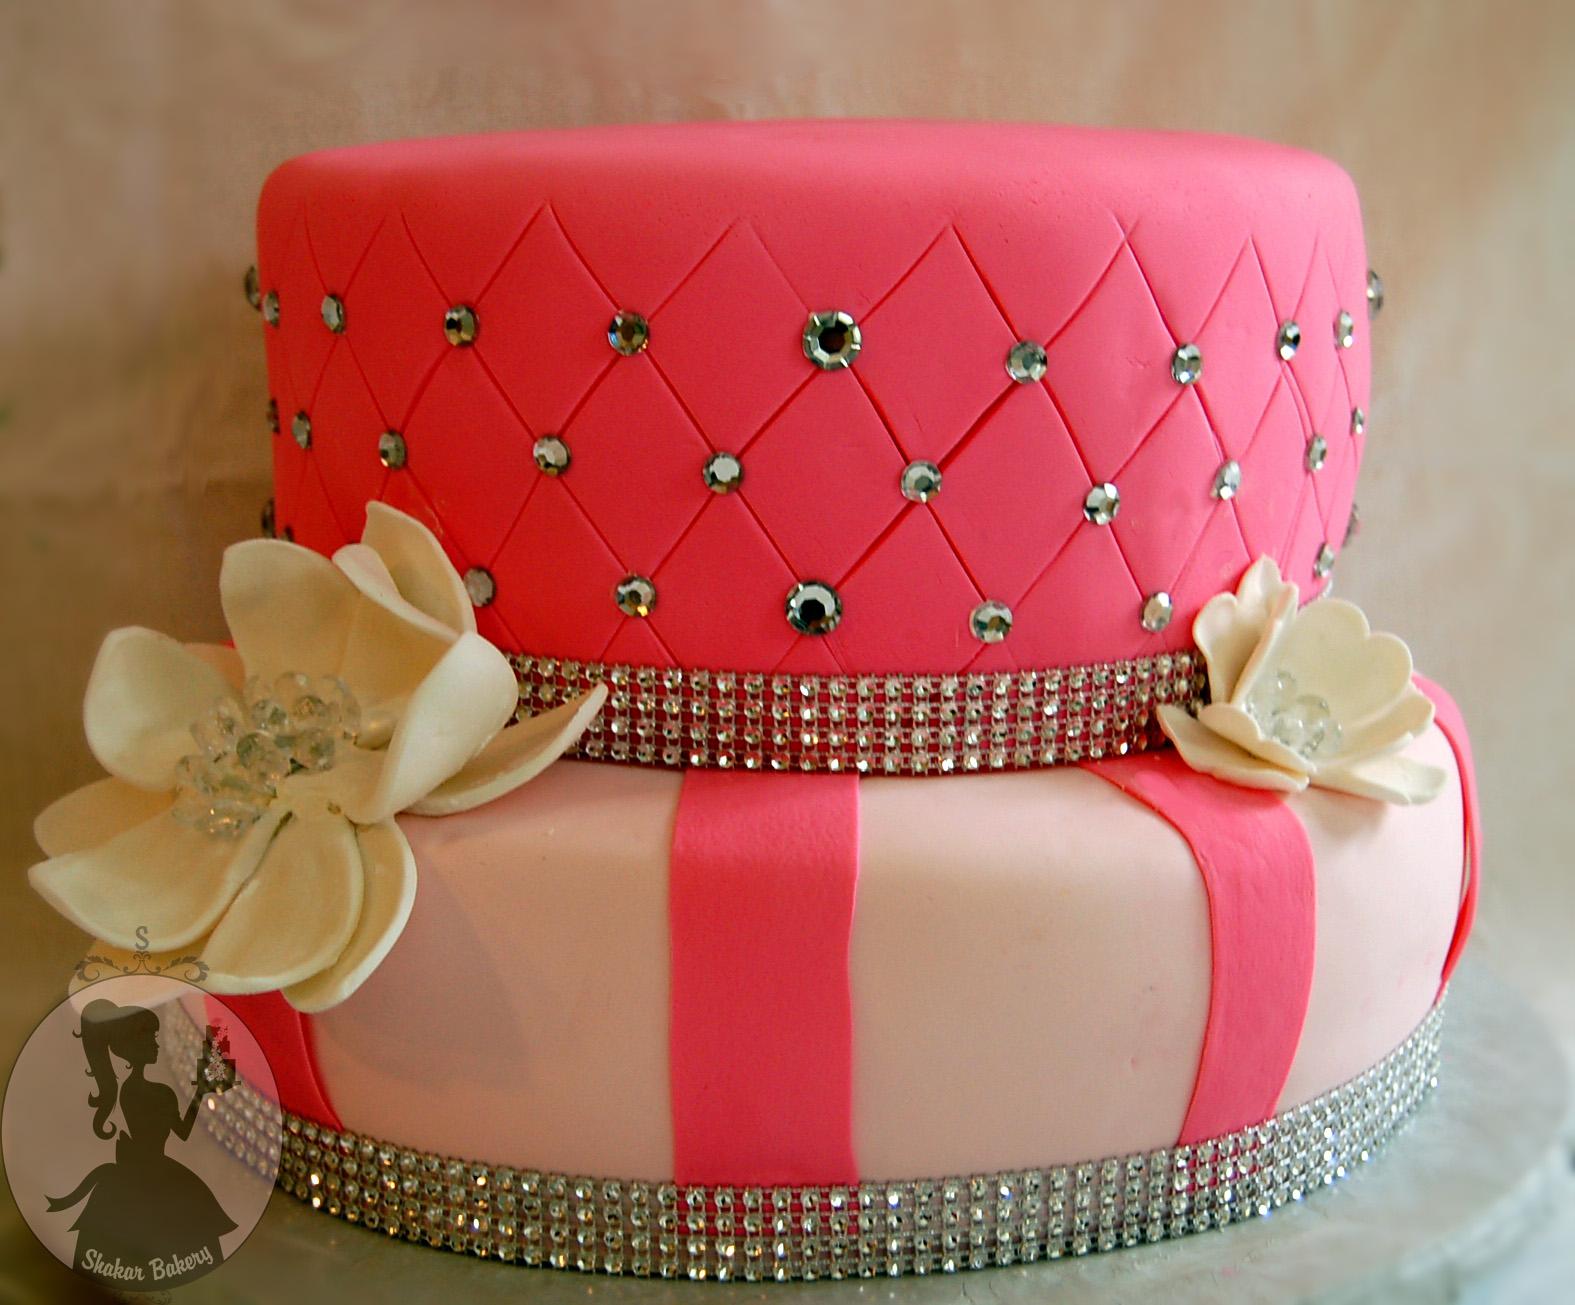 Edible Diamonds For Wedding Cakes